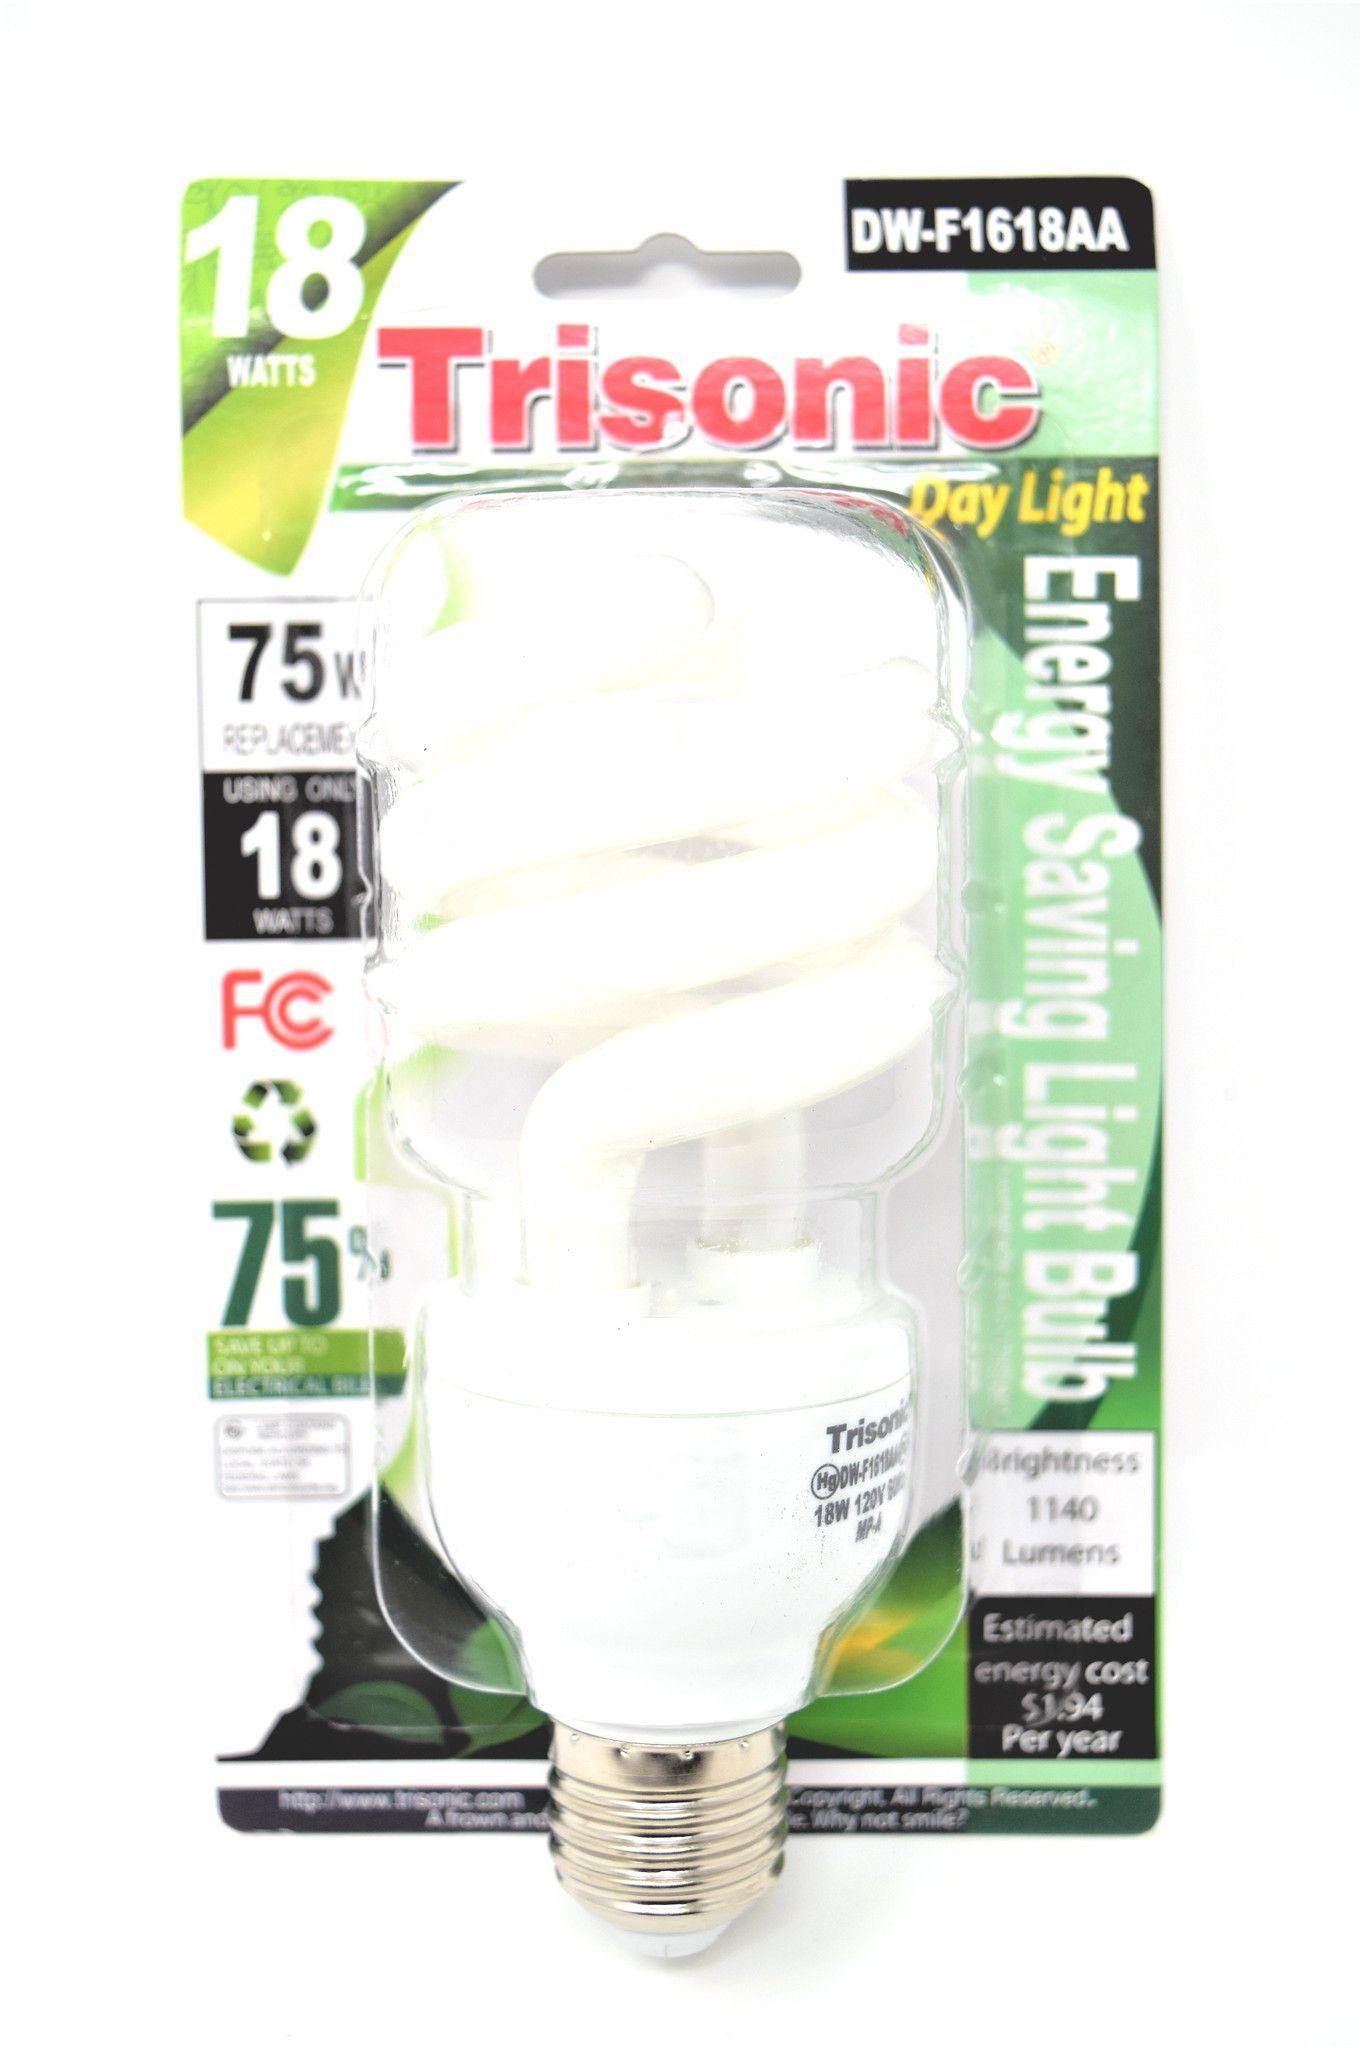 Trisonic 18 Watts Day Light Energy Saving Light Bulb ...